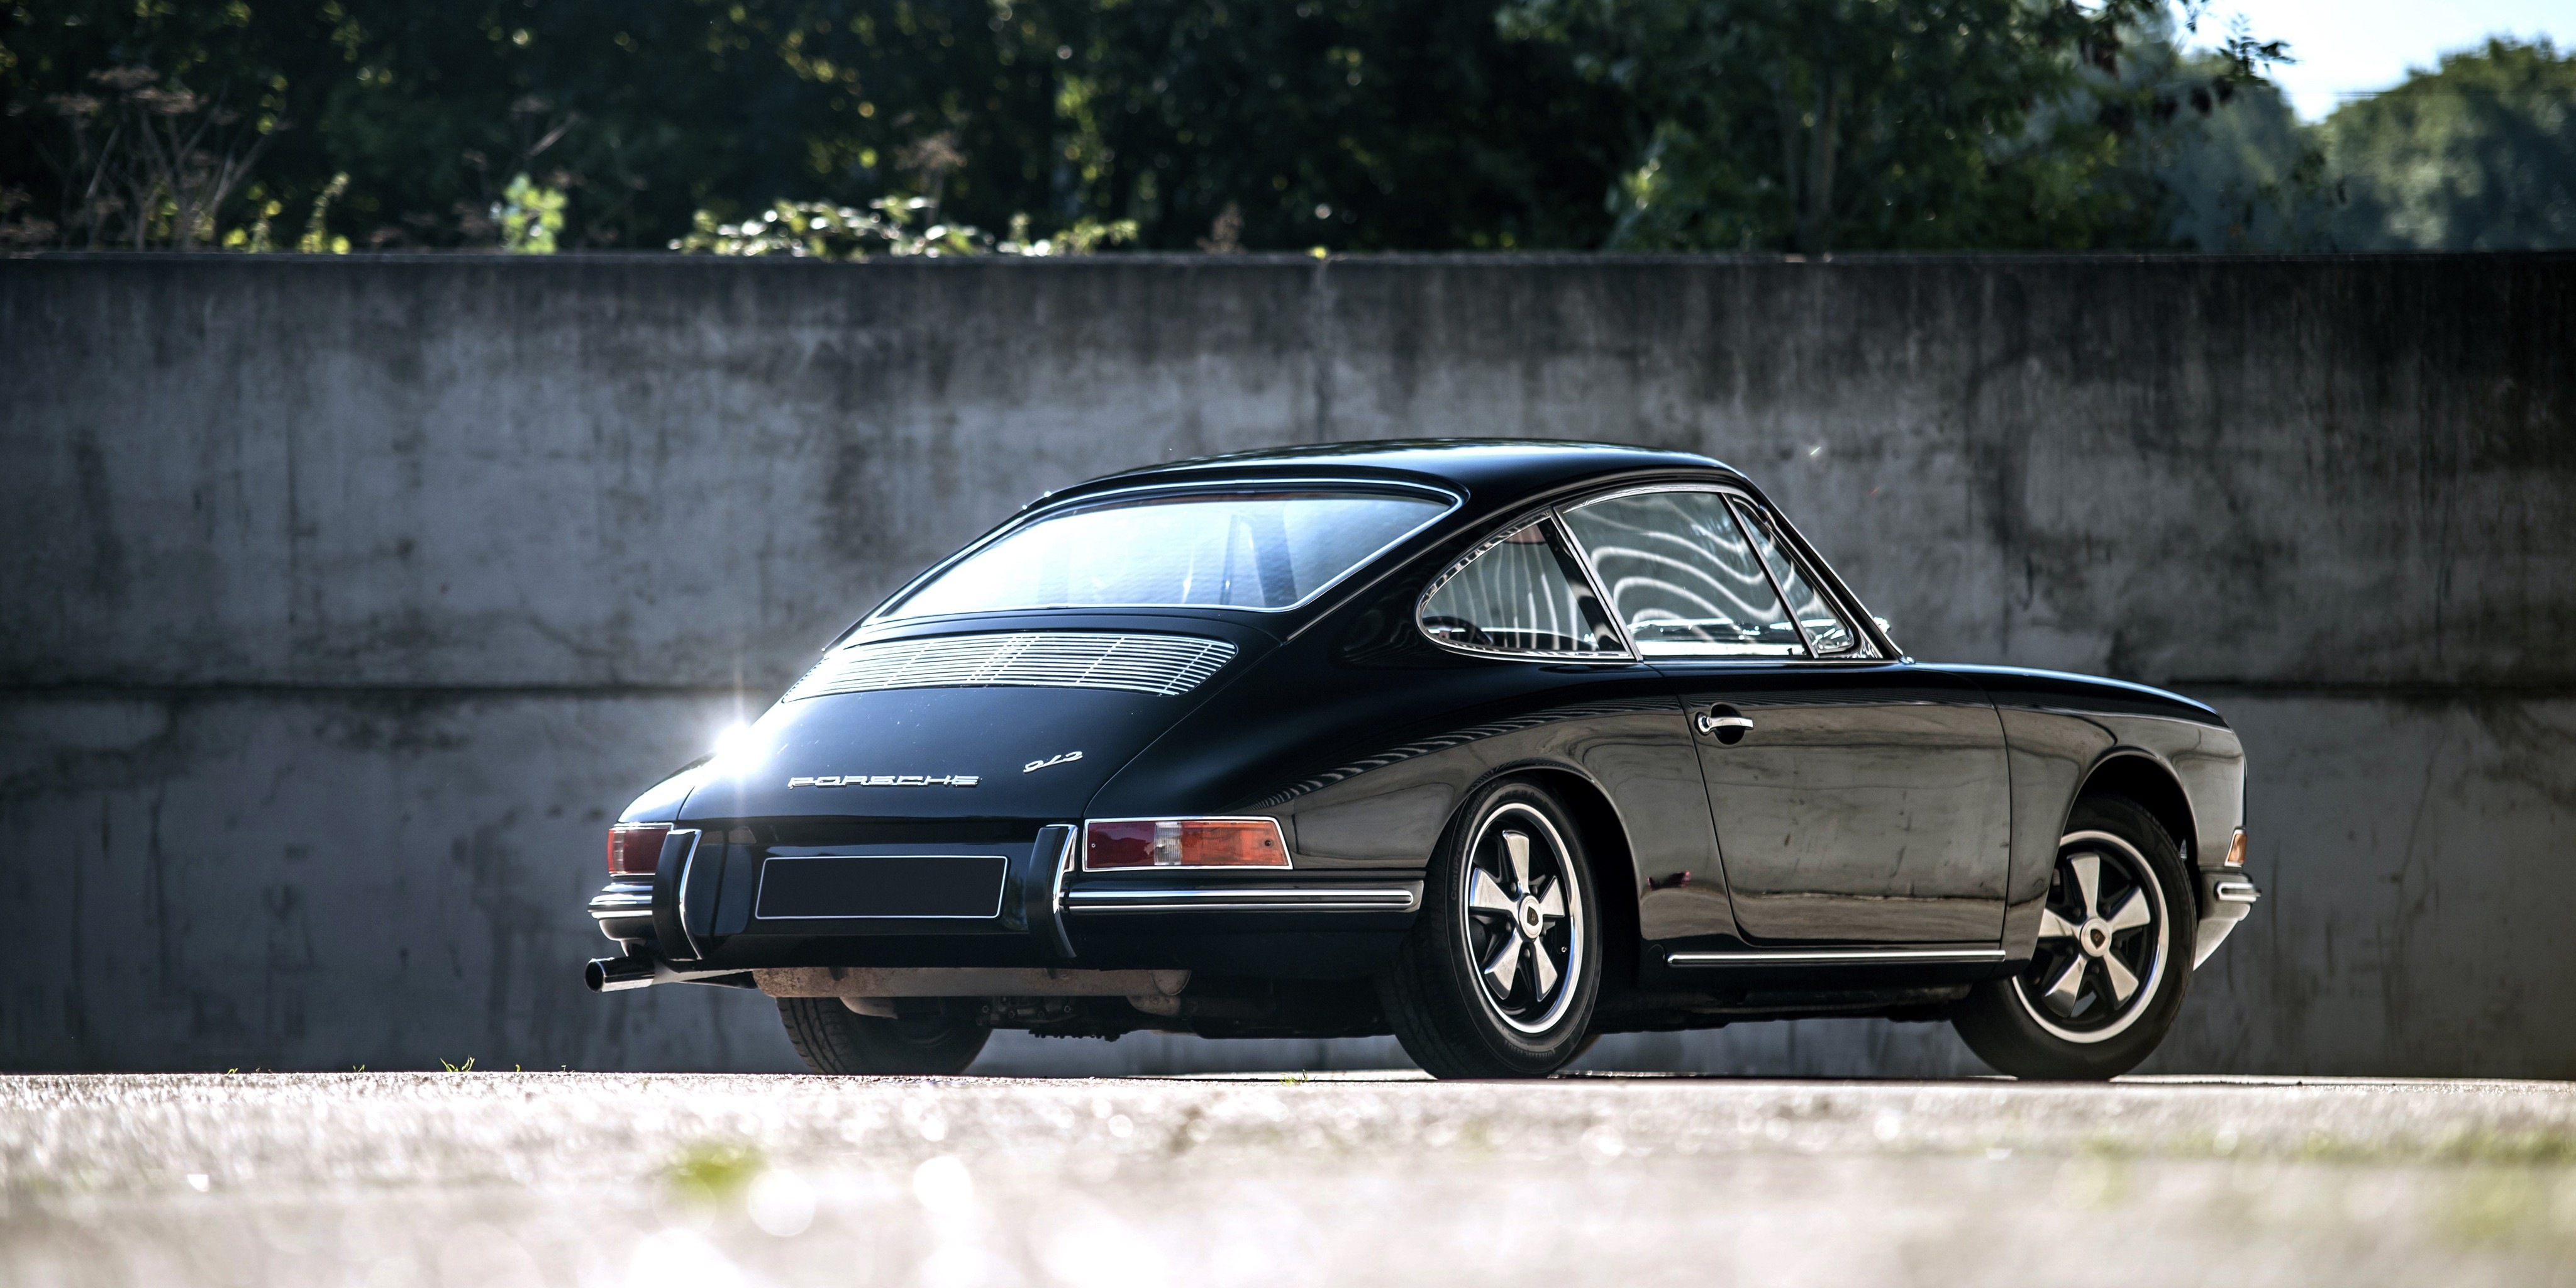 Porsche 911 Models >> PORSCHE 912 (901) - 1965, 1966, 1967, 1968, 1969 - autoevolution